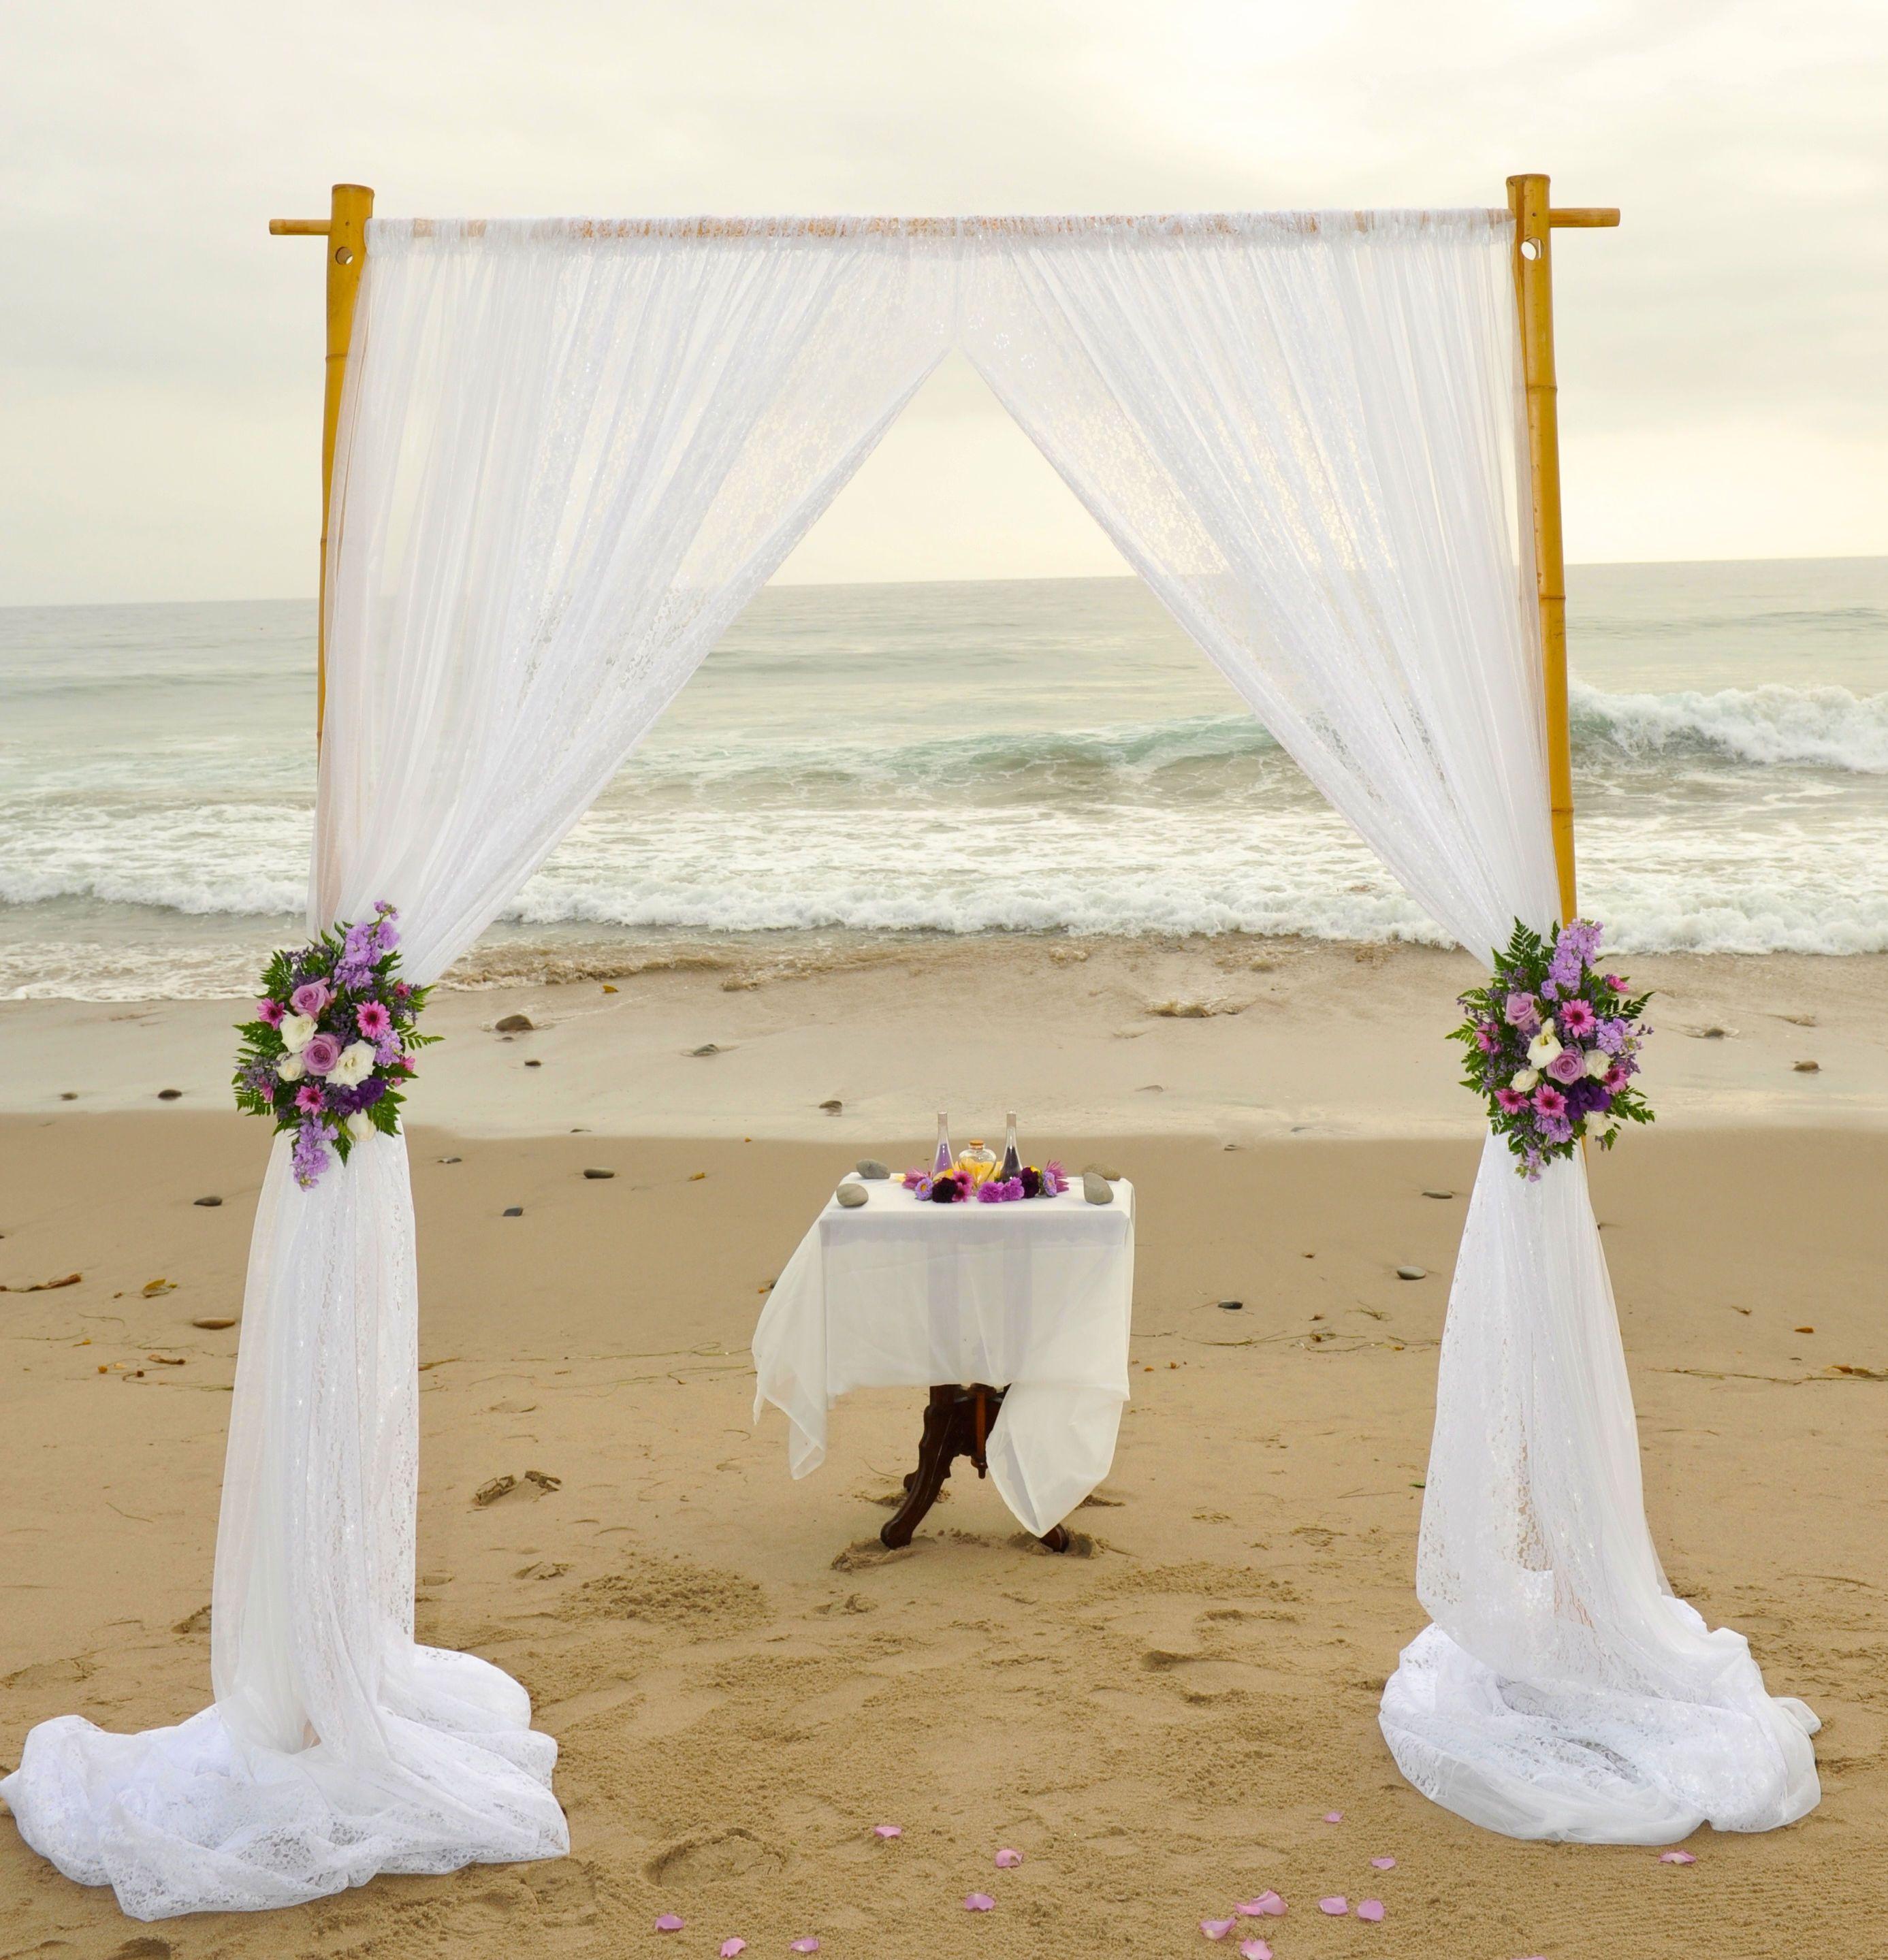 Purple Wedding Arch Decoration Ideas: Bamboo Wedding Arch, White Fabirc, Purple Flowers